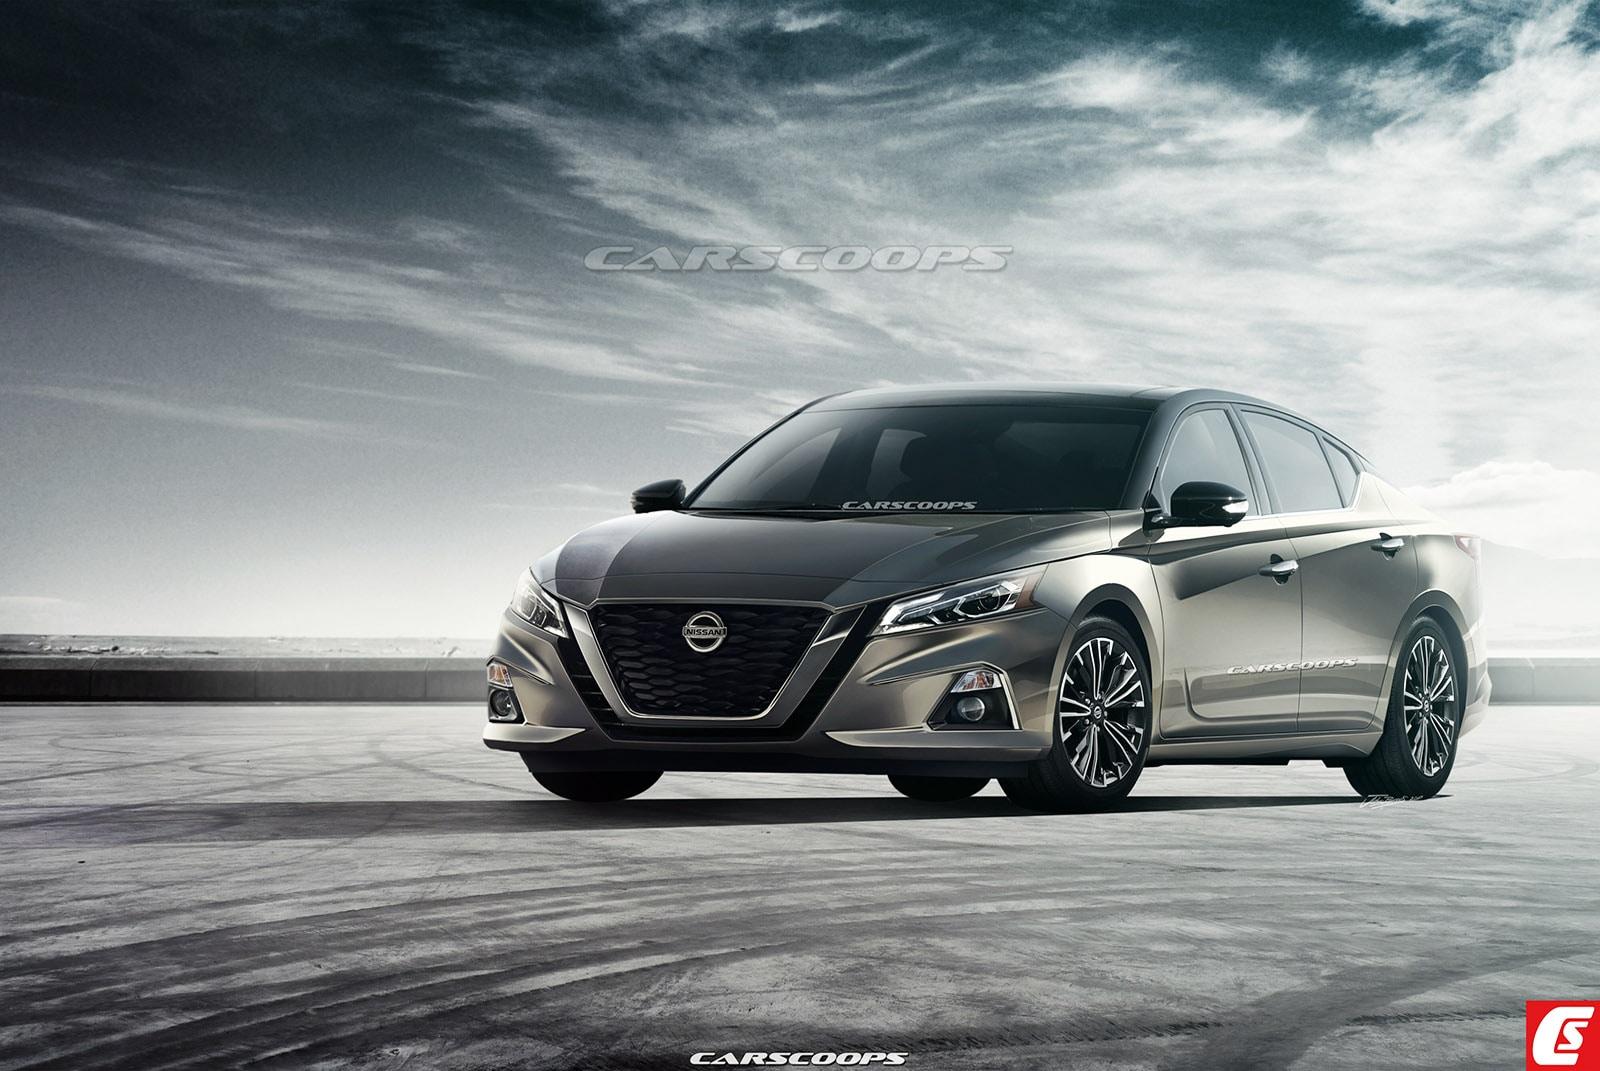 Nissan Altima 2019 Cars